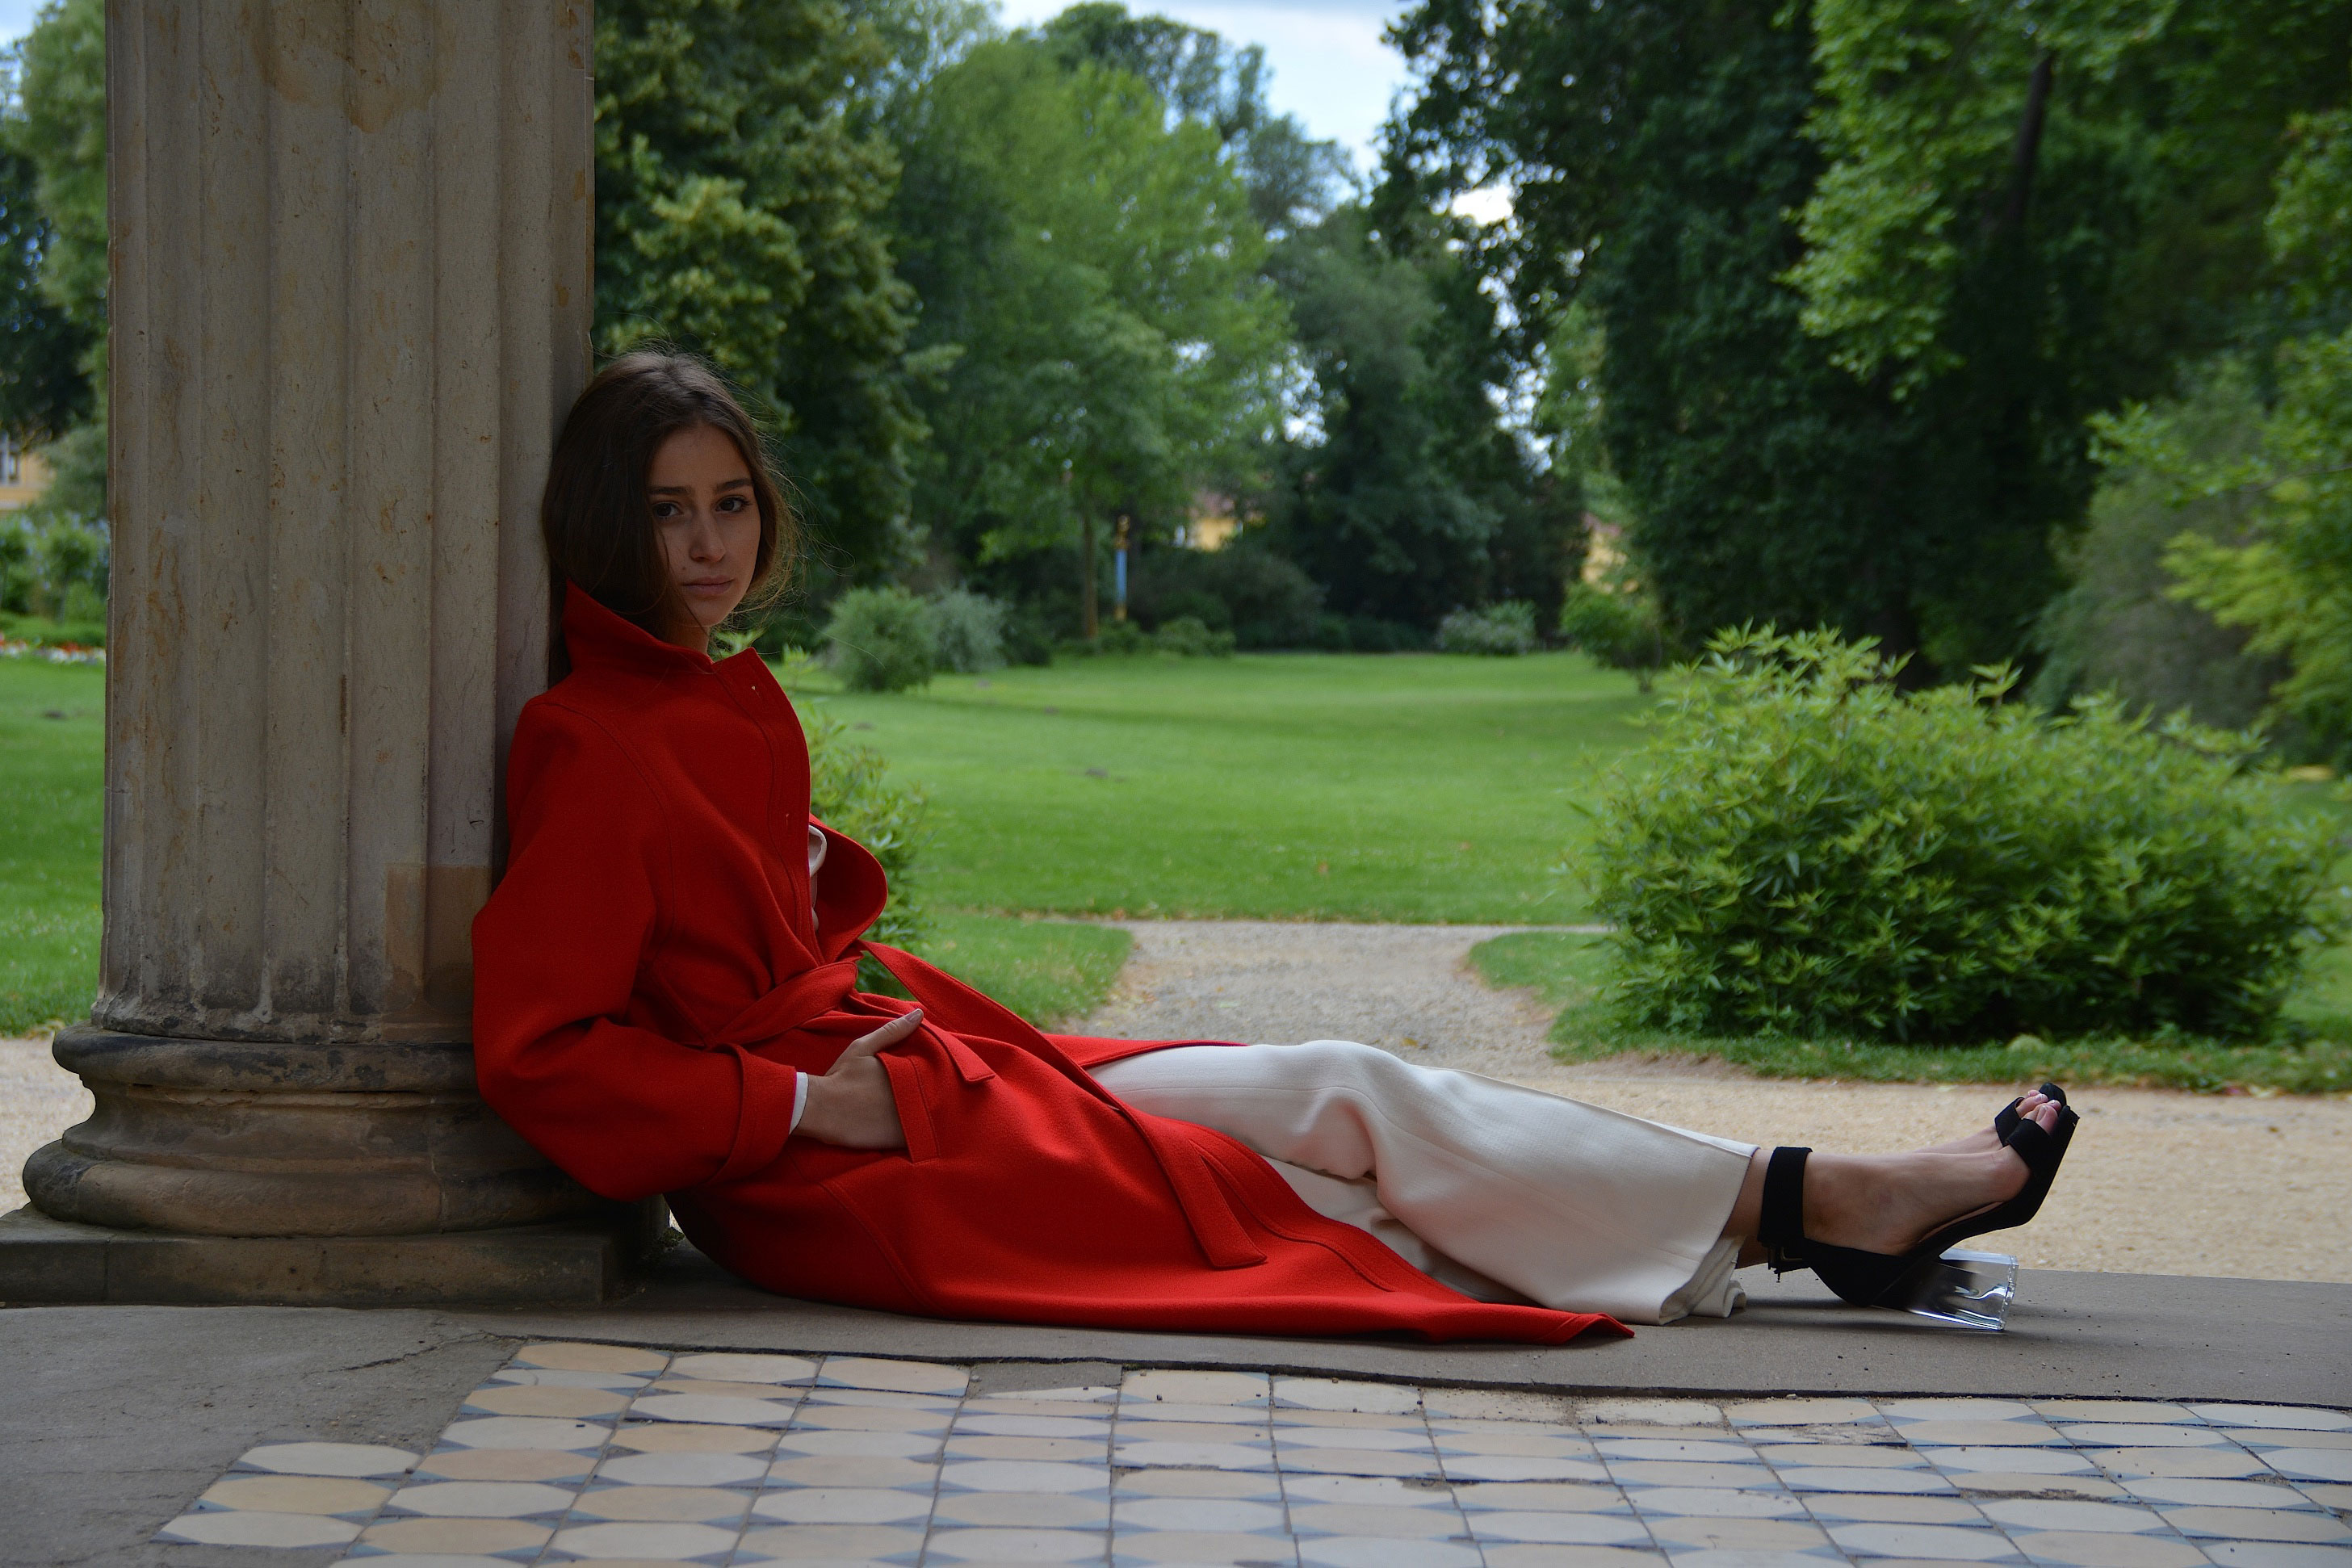 Park Sanssouci,Potsdam  model_romy nest  photo_karl von der ahé